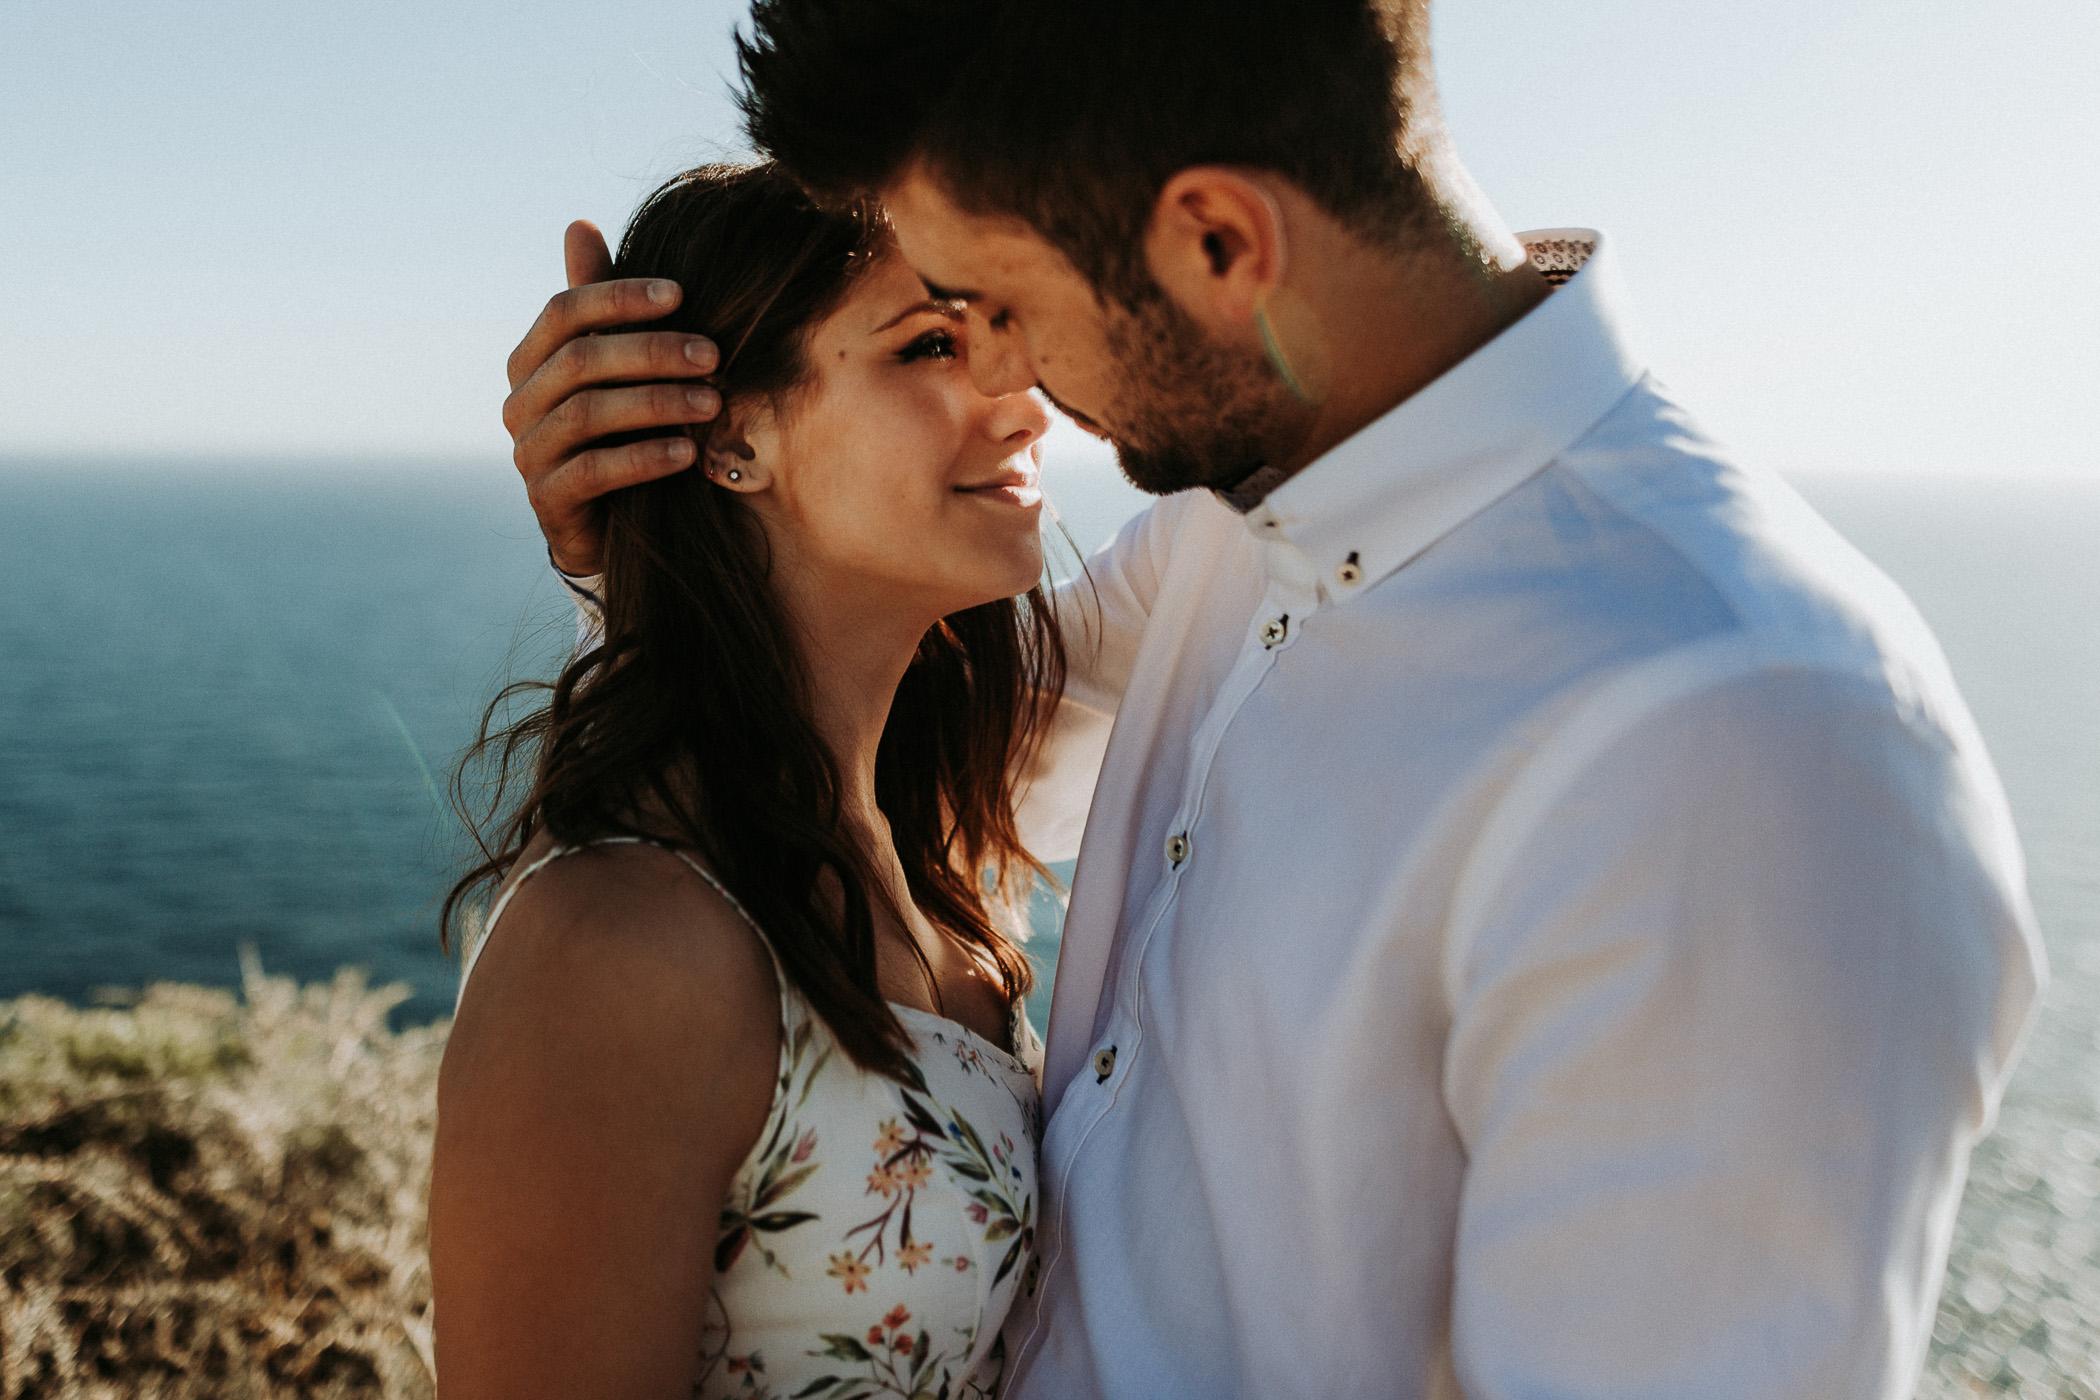 DanielaMarquardtPhotography_wedding_elopement_mallorca_spain_calapi_palma_lauraandtoni_224